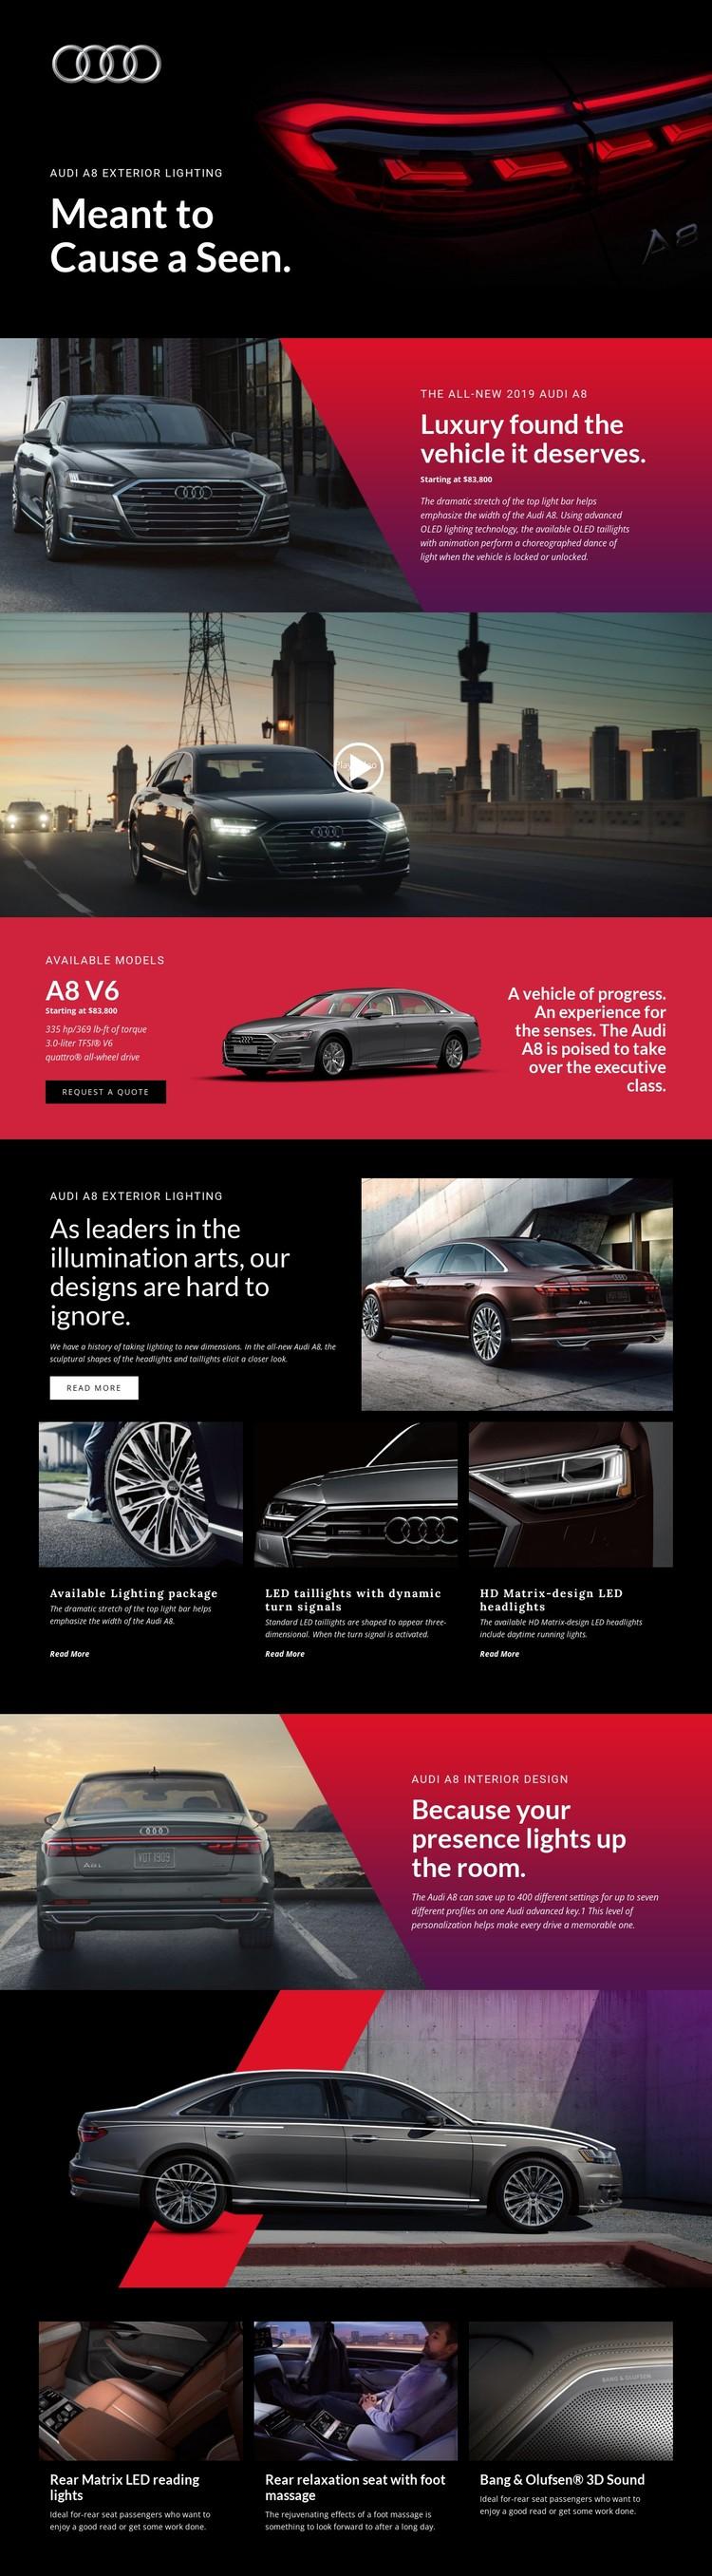 Audi luxury cars CSS Template